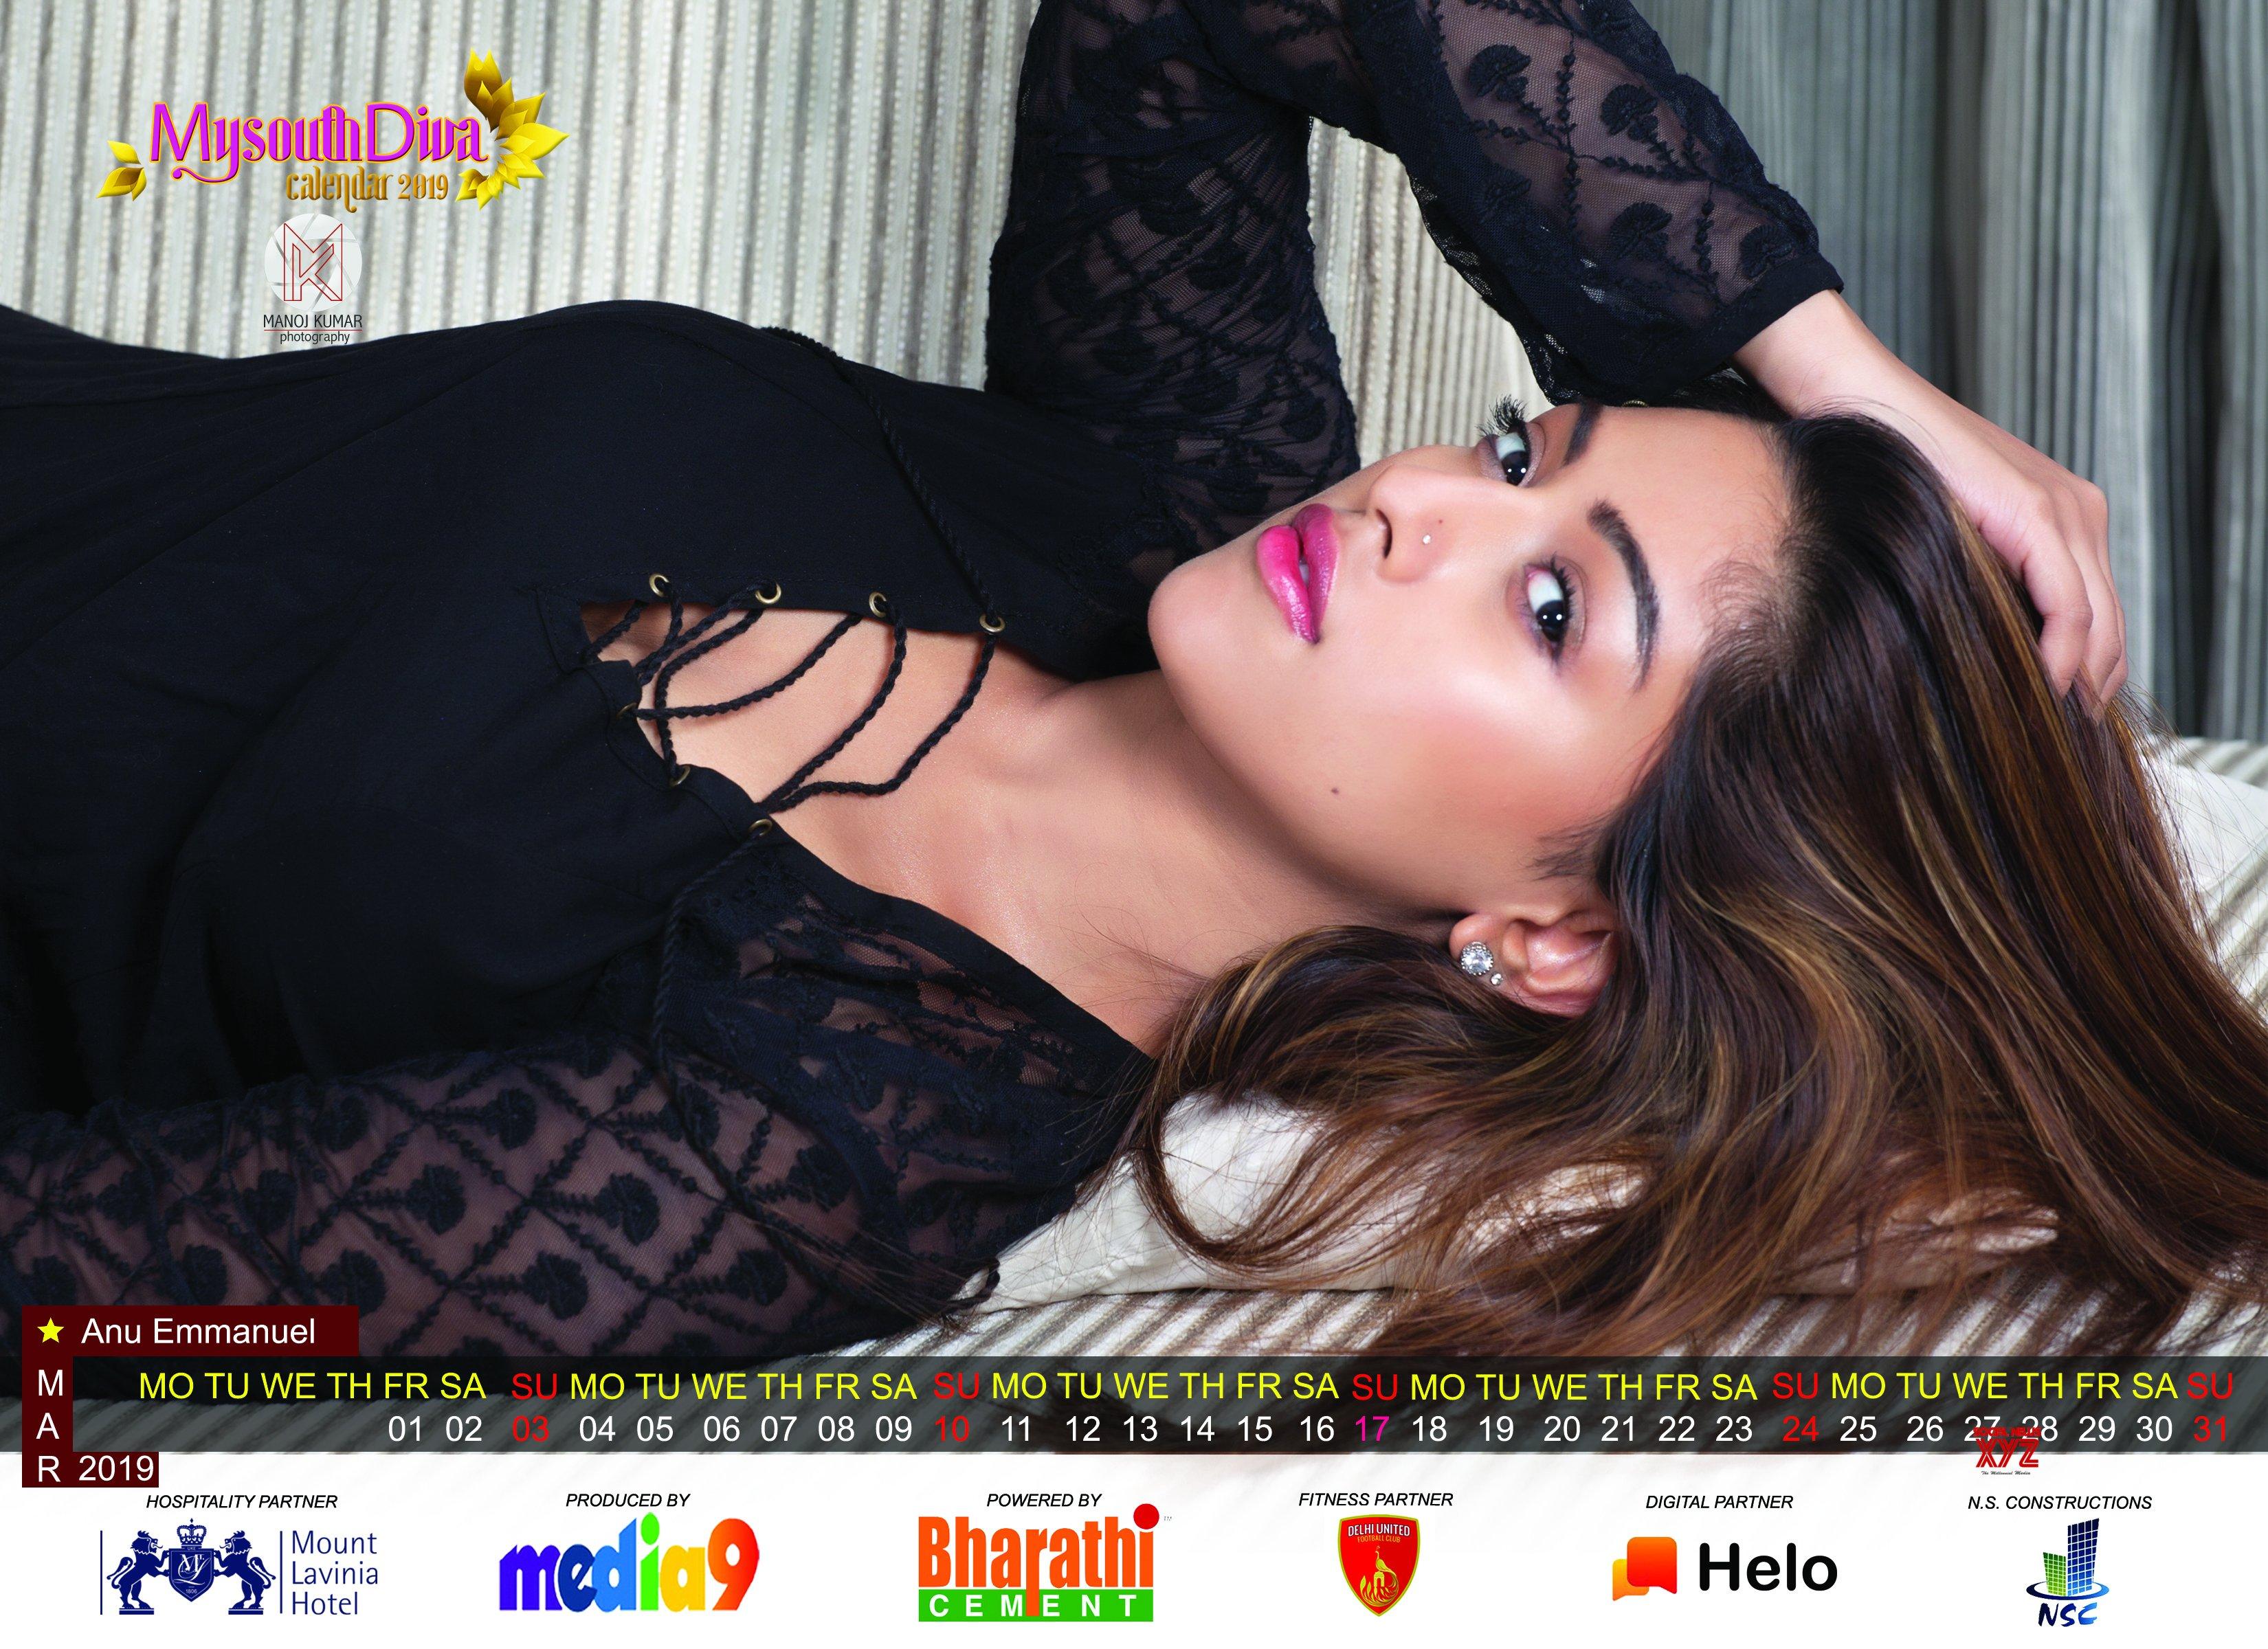 My South Diva Hot Calendar 2019 HD Gallery